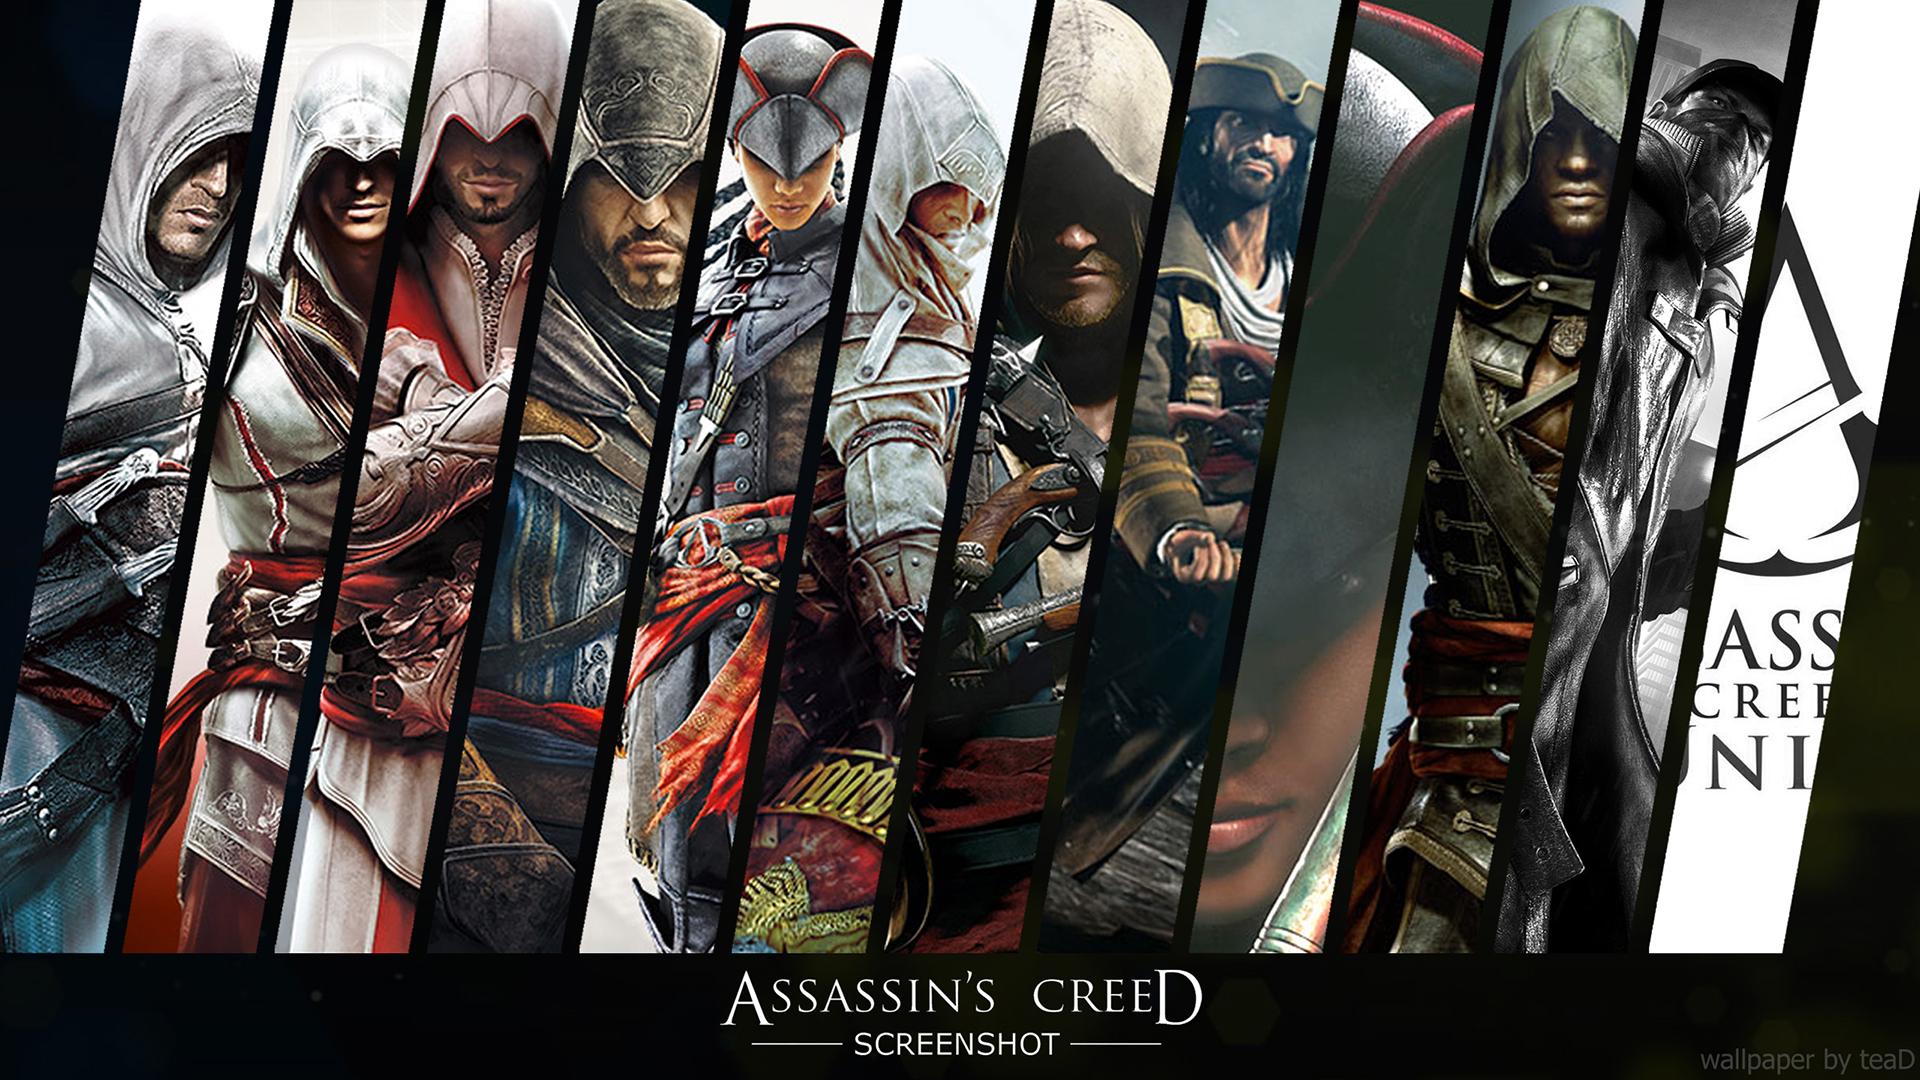 Hd wallpaper free - Assassin S Creed Live Wallpaper Wallpapersafari